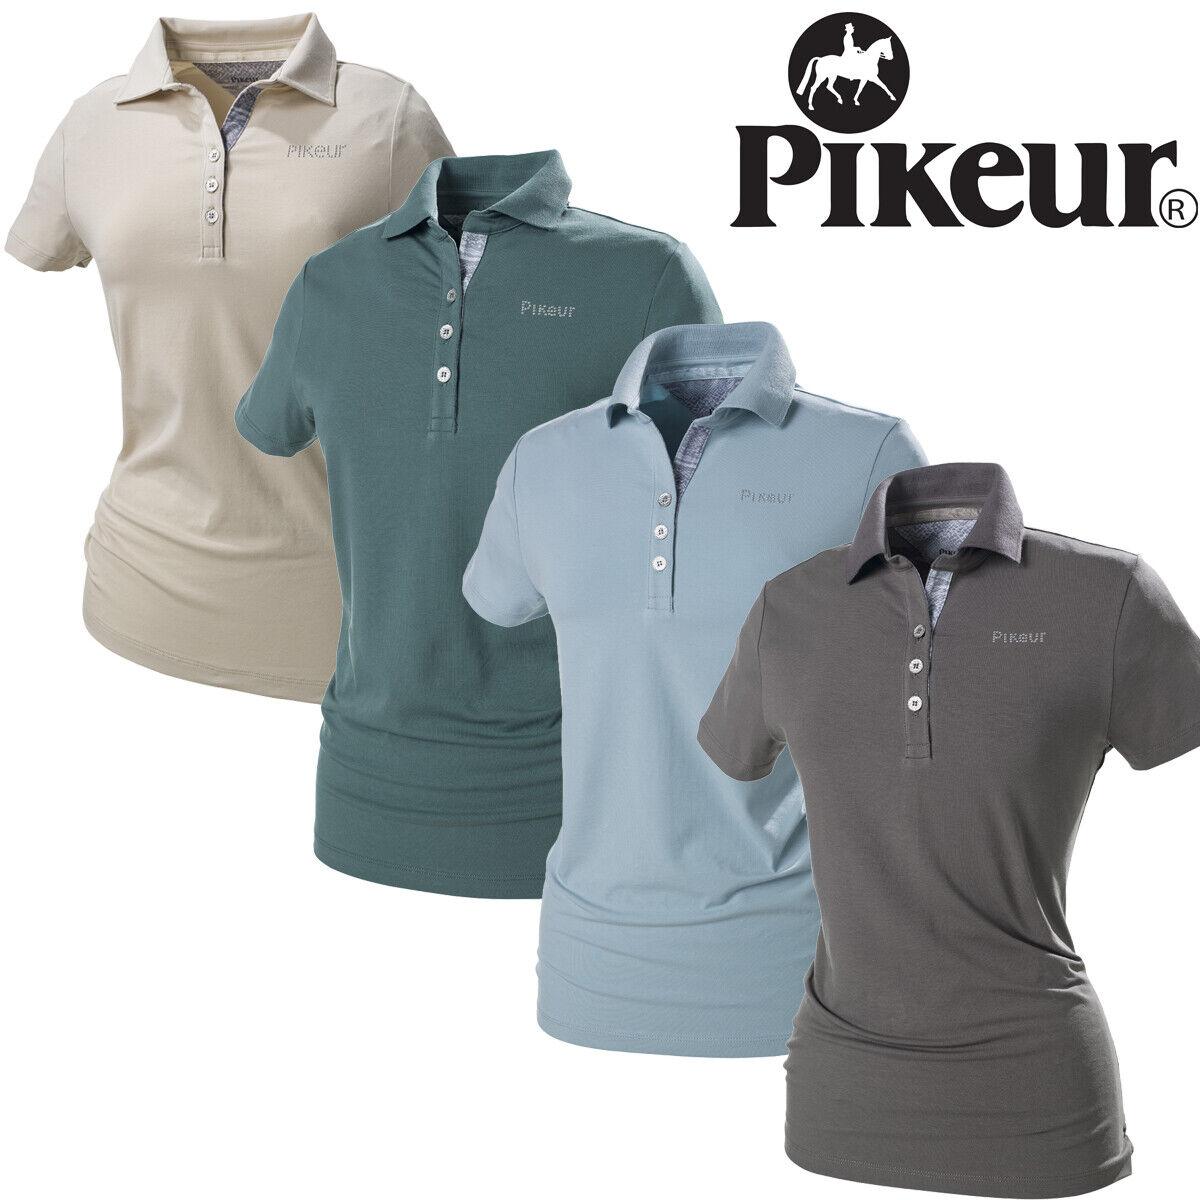 Pikeur Mariella Dames Premium Polo Shirt Gratis UK Shipping